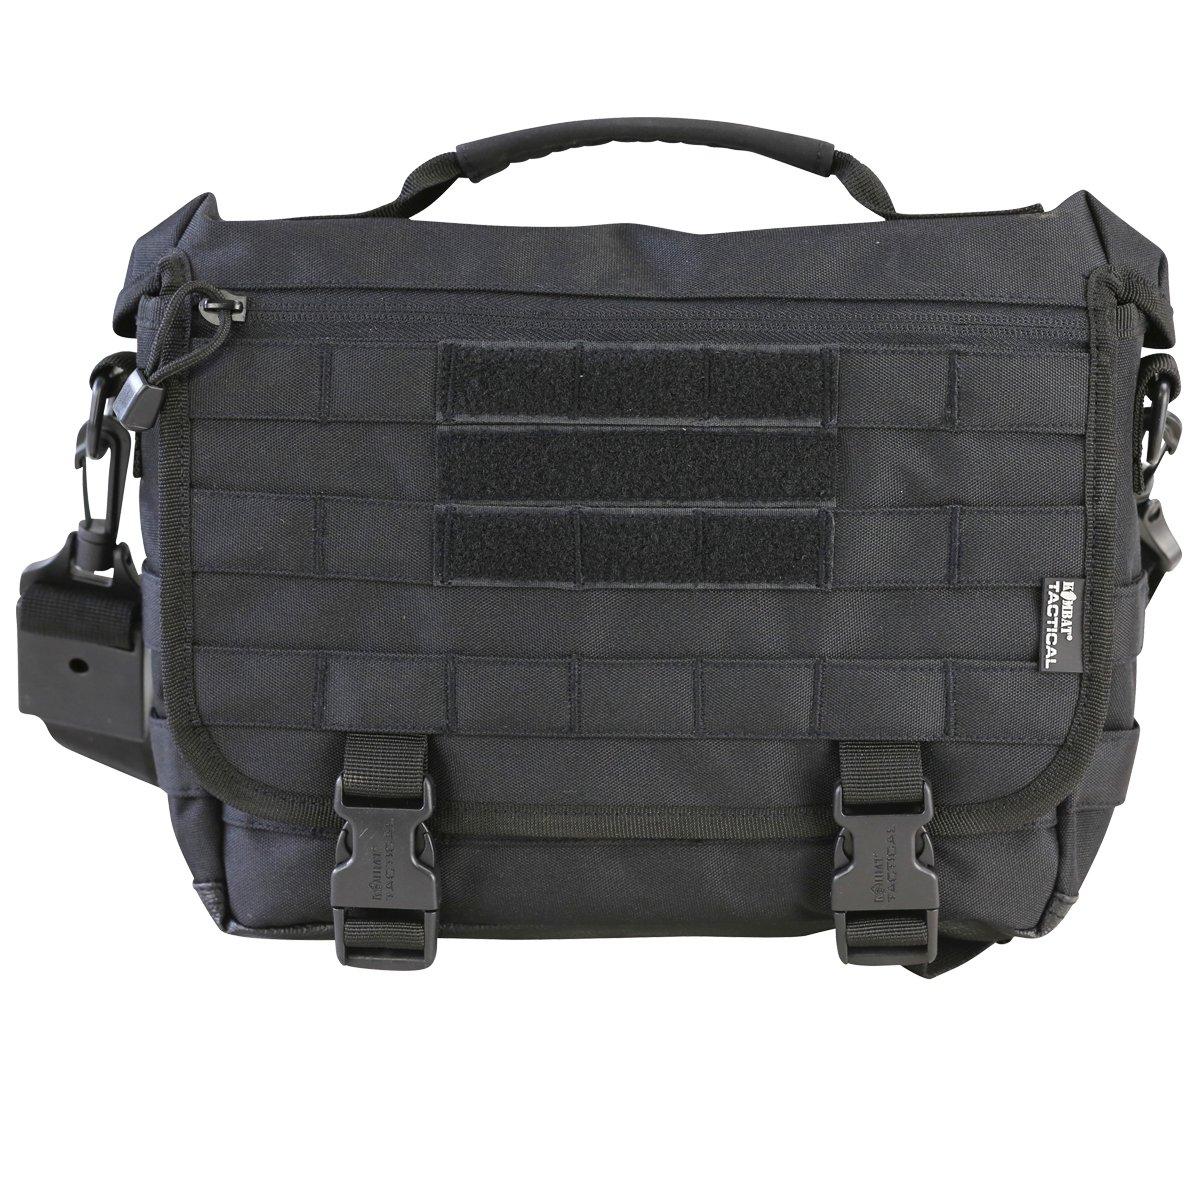 Kombat UK Unisex s Small Messenger Bag, Black, One Size  Amazon.co.uk   Sports   Outdoors 8a2d2991fa